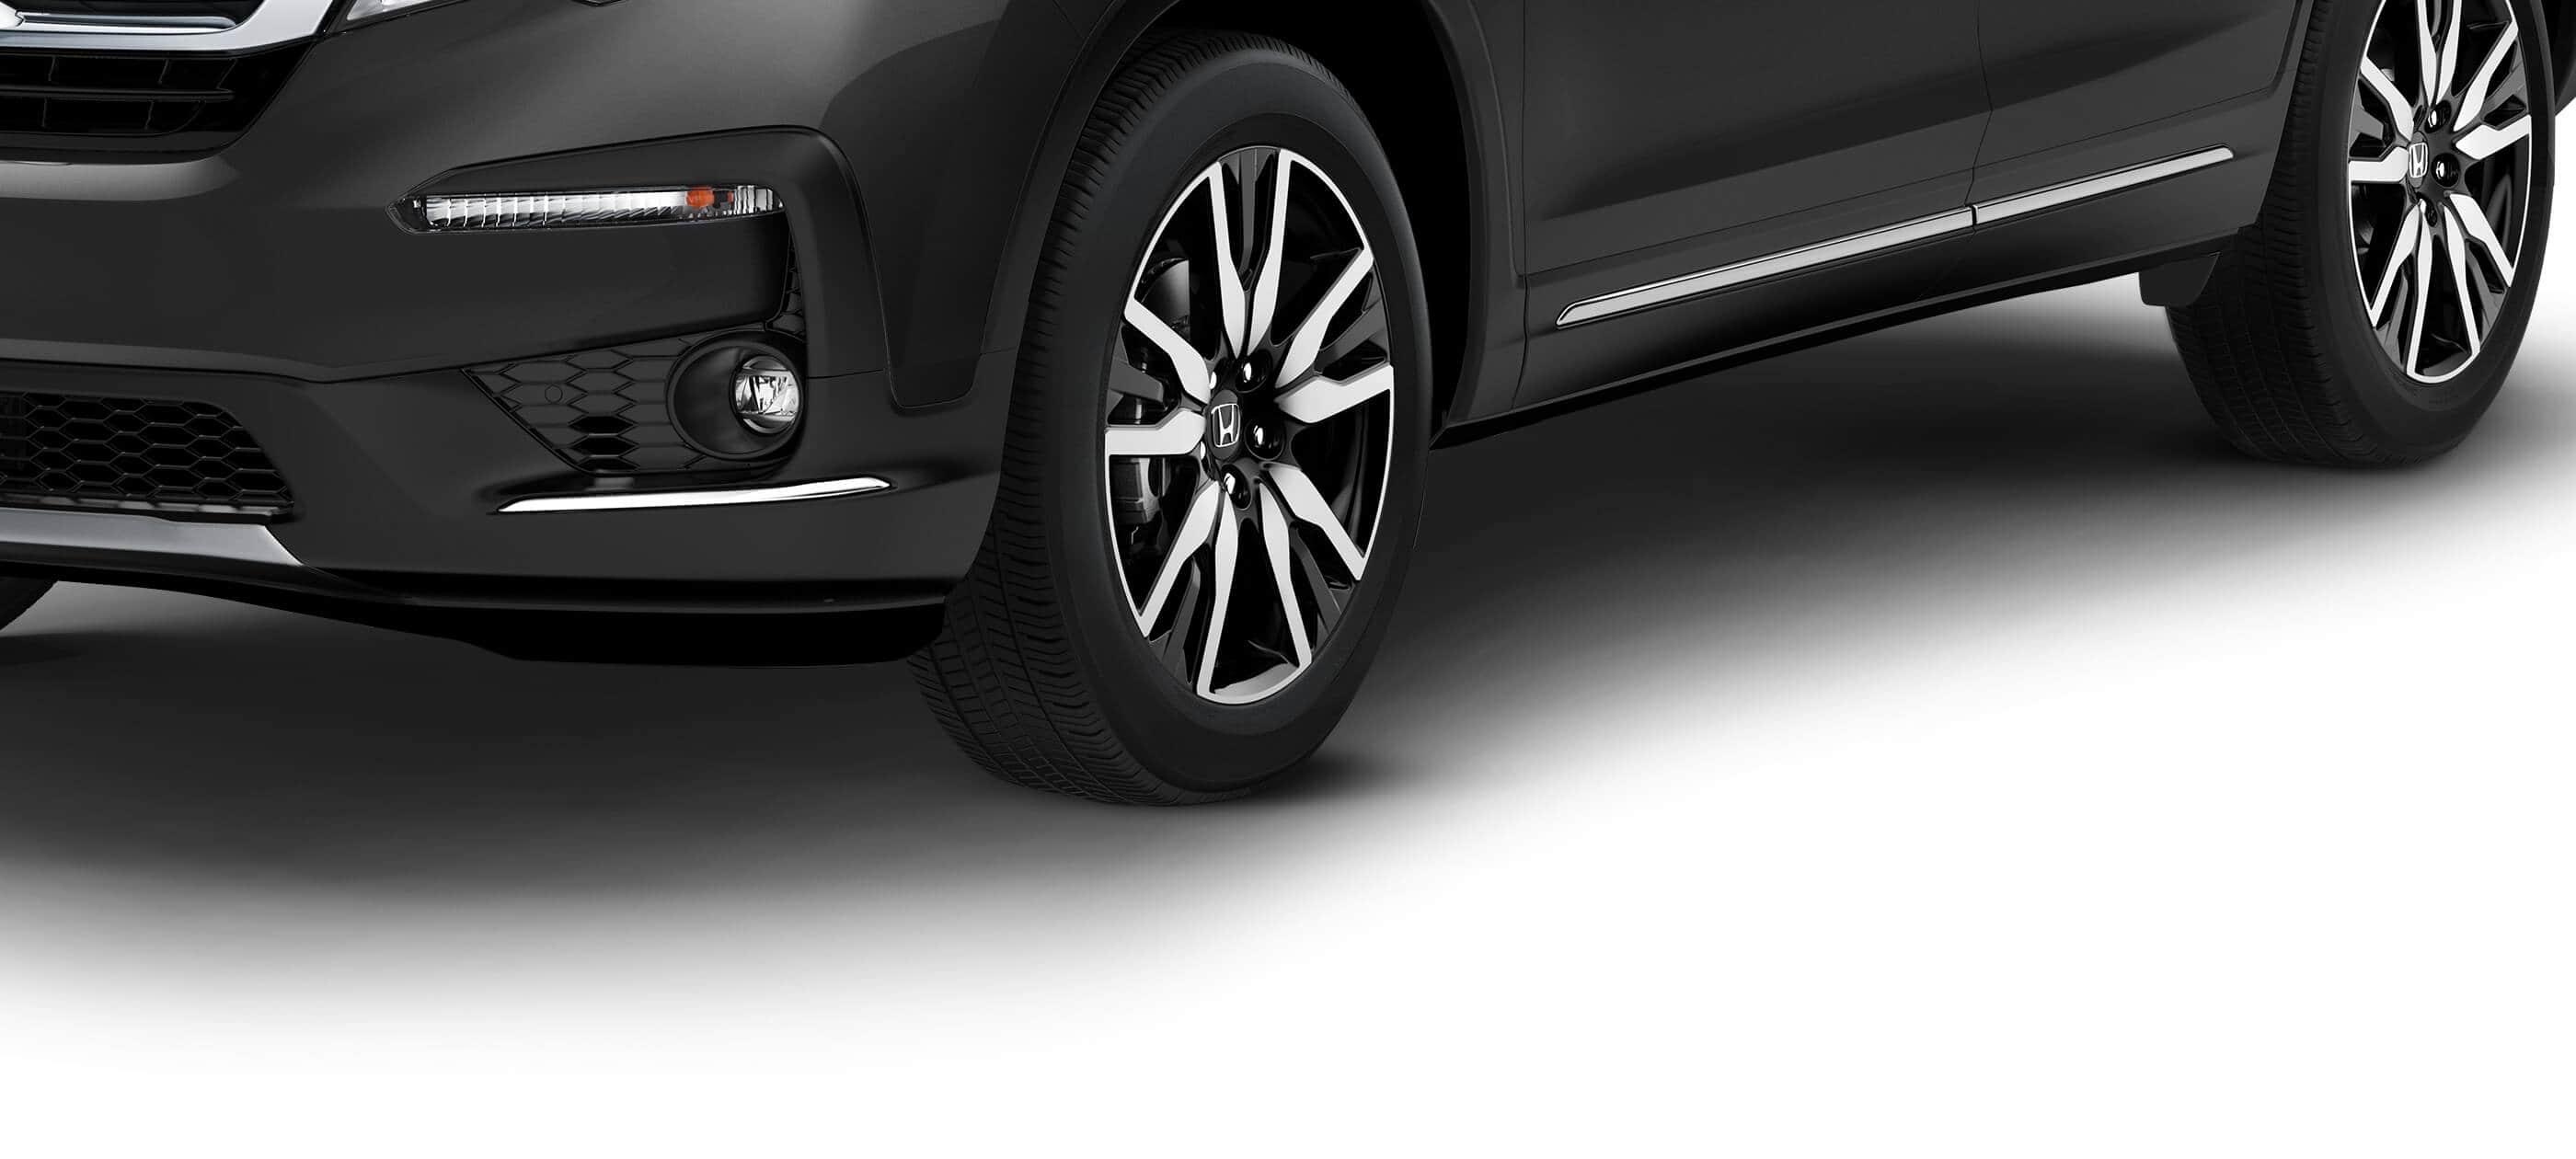 2019 Honda Pilot New England Dealers Association Modern Towing Wiring Harness 20 Inch Alloy Wheels